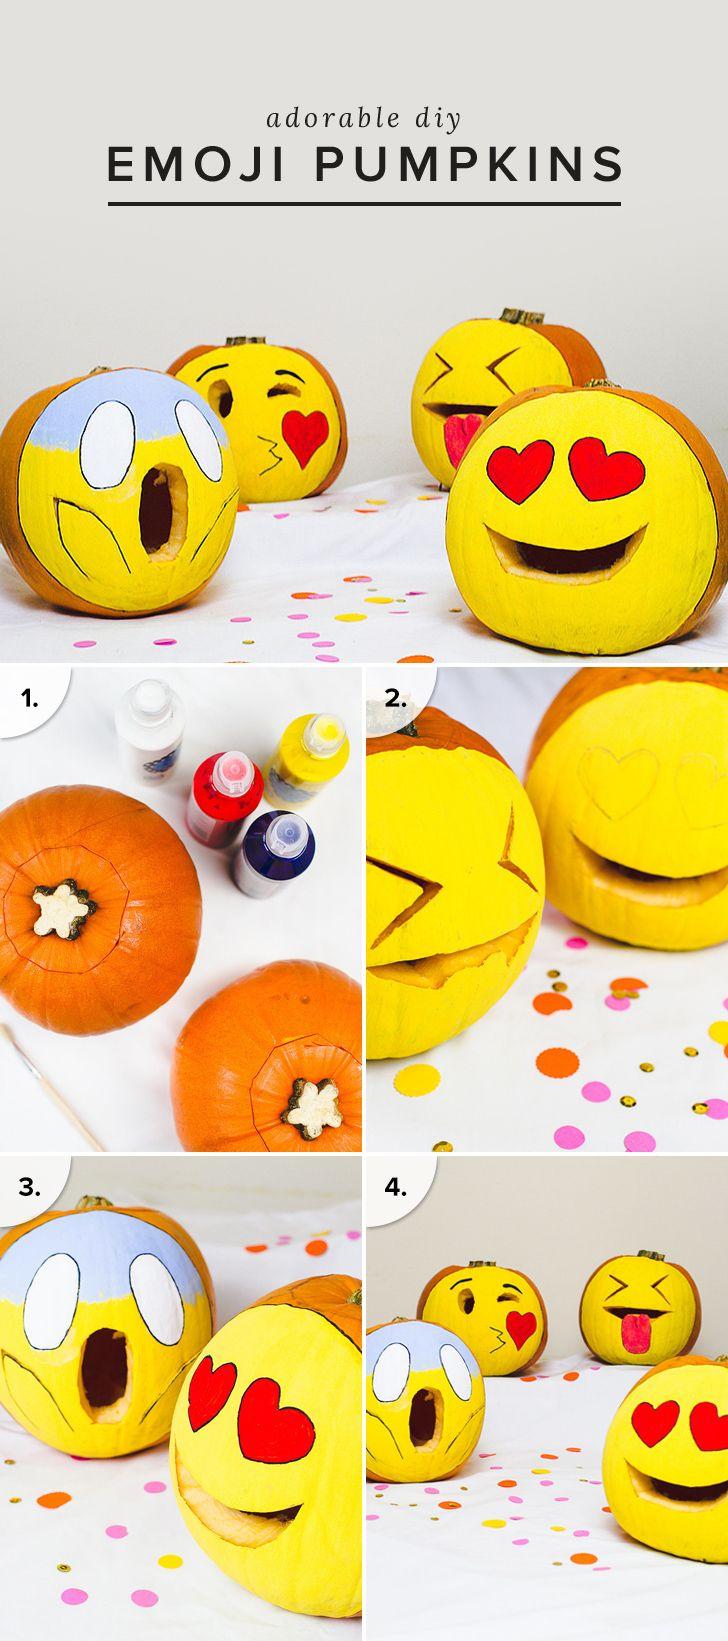 These DIY Emoji Pumpkins Are Too Darn Cute